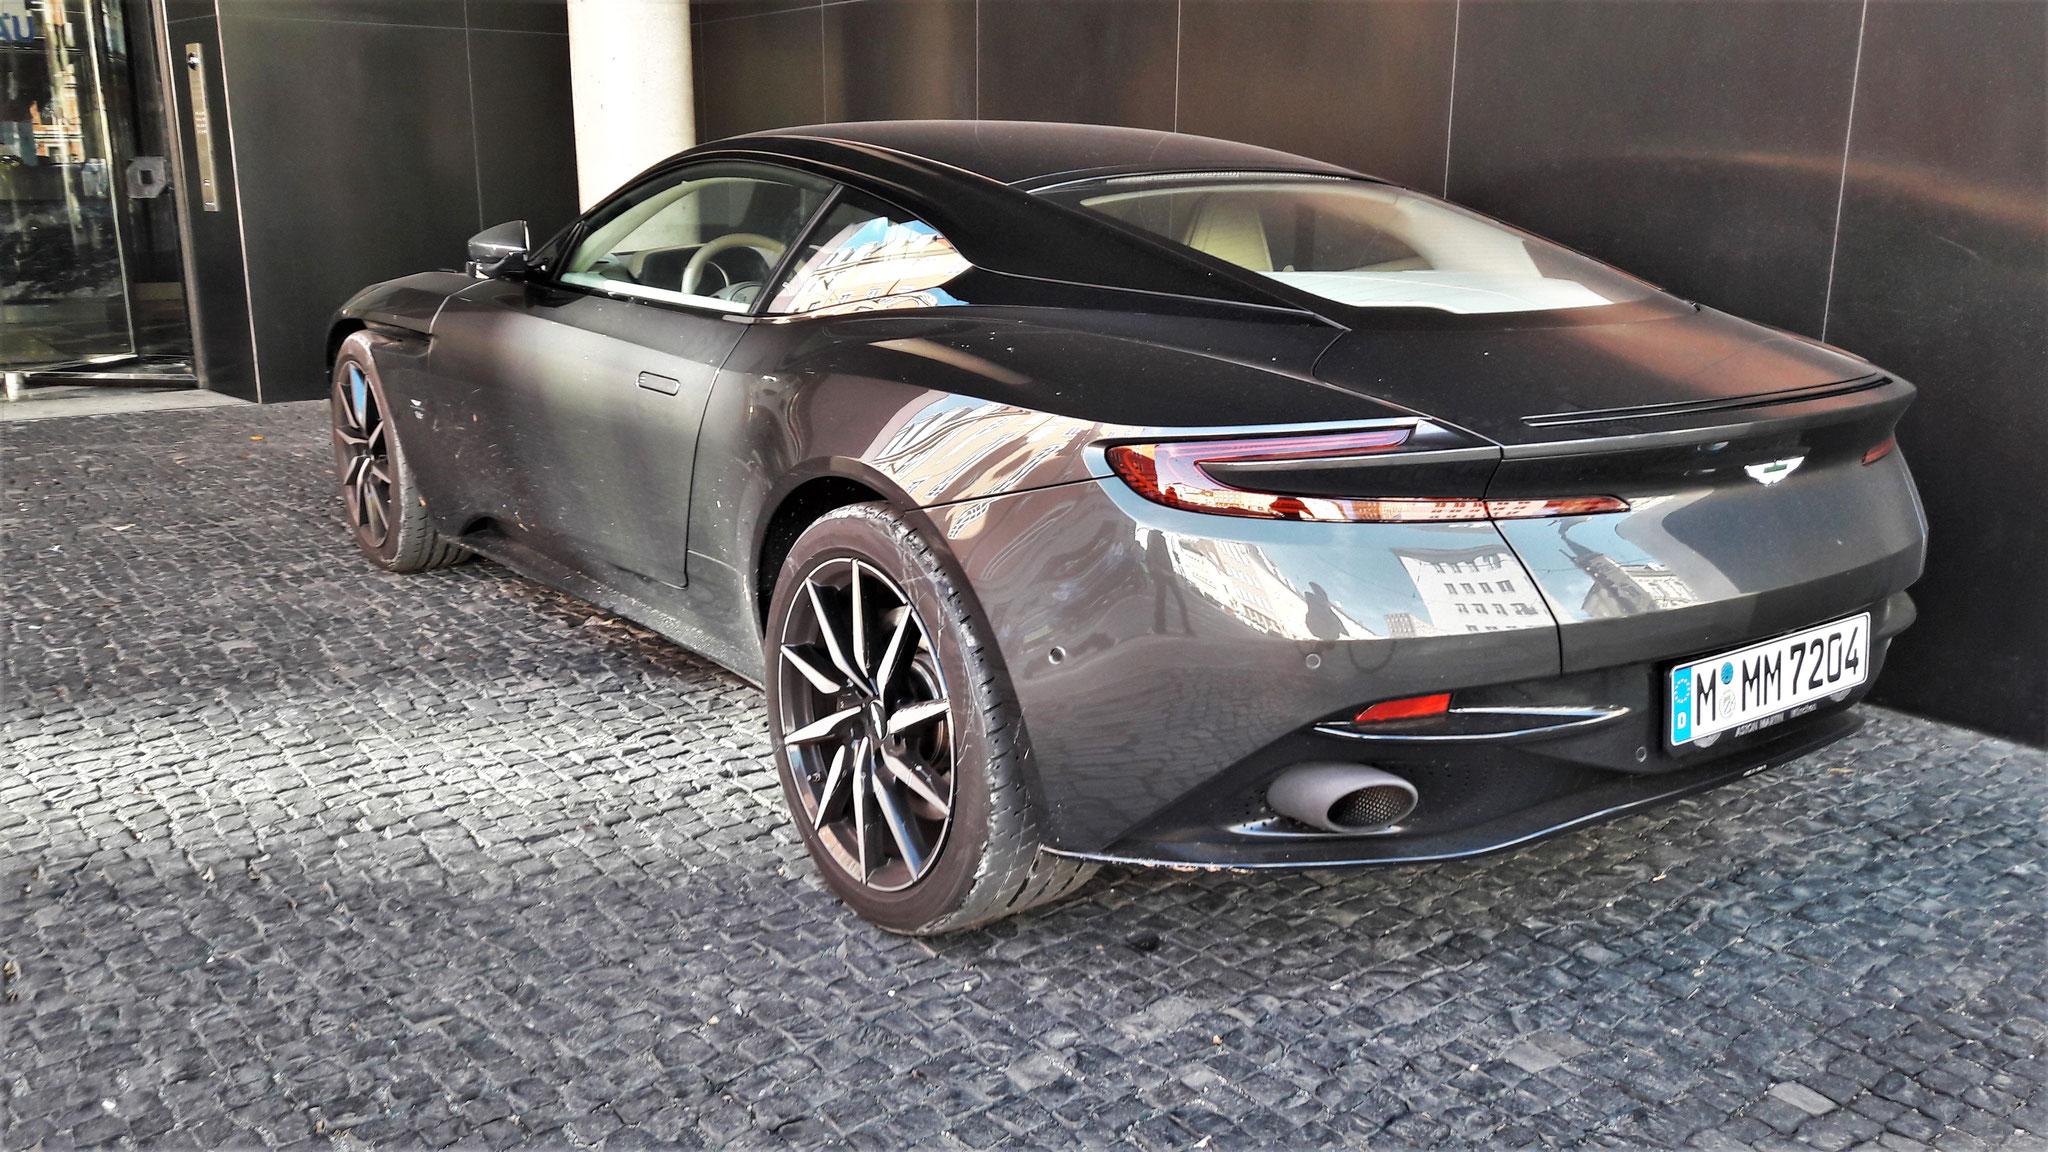 Aston Martin DB11 - M-MM-7204